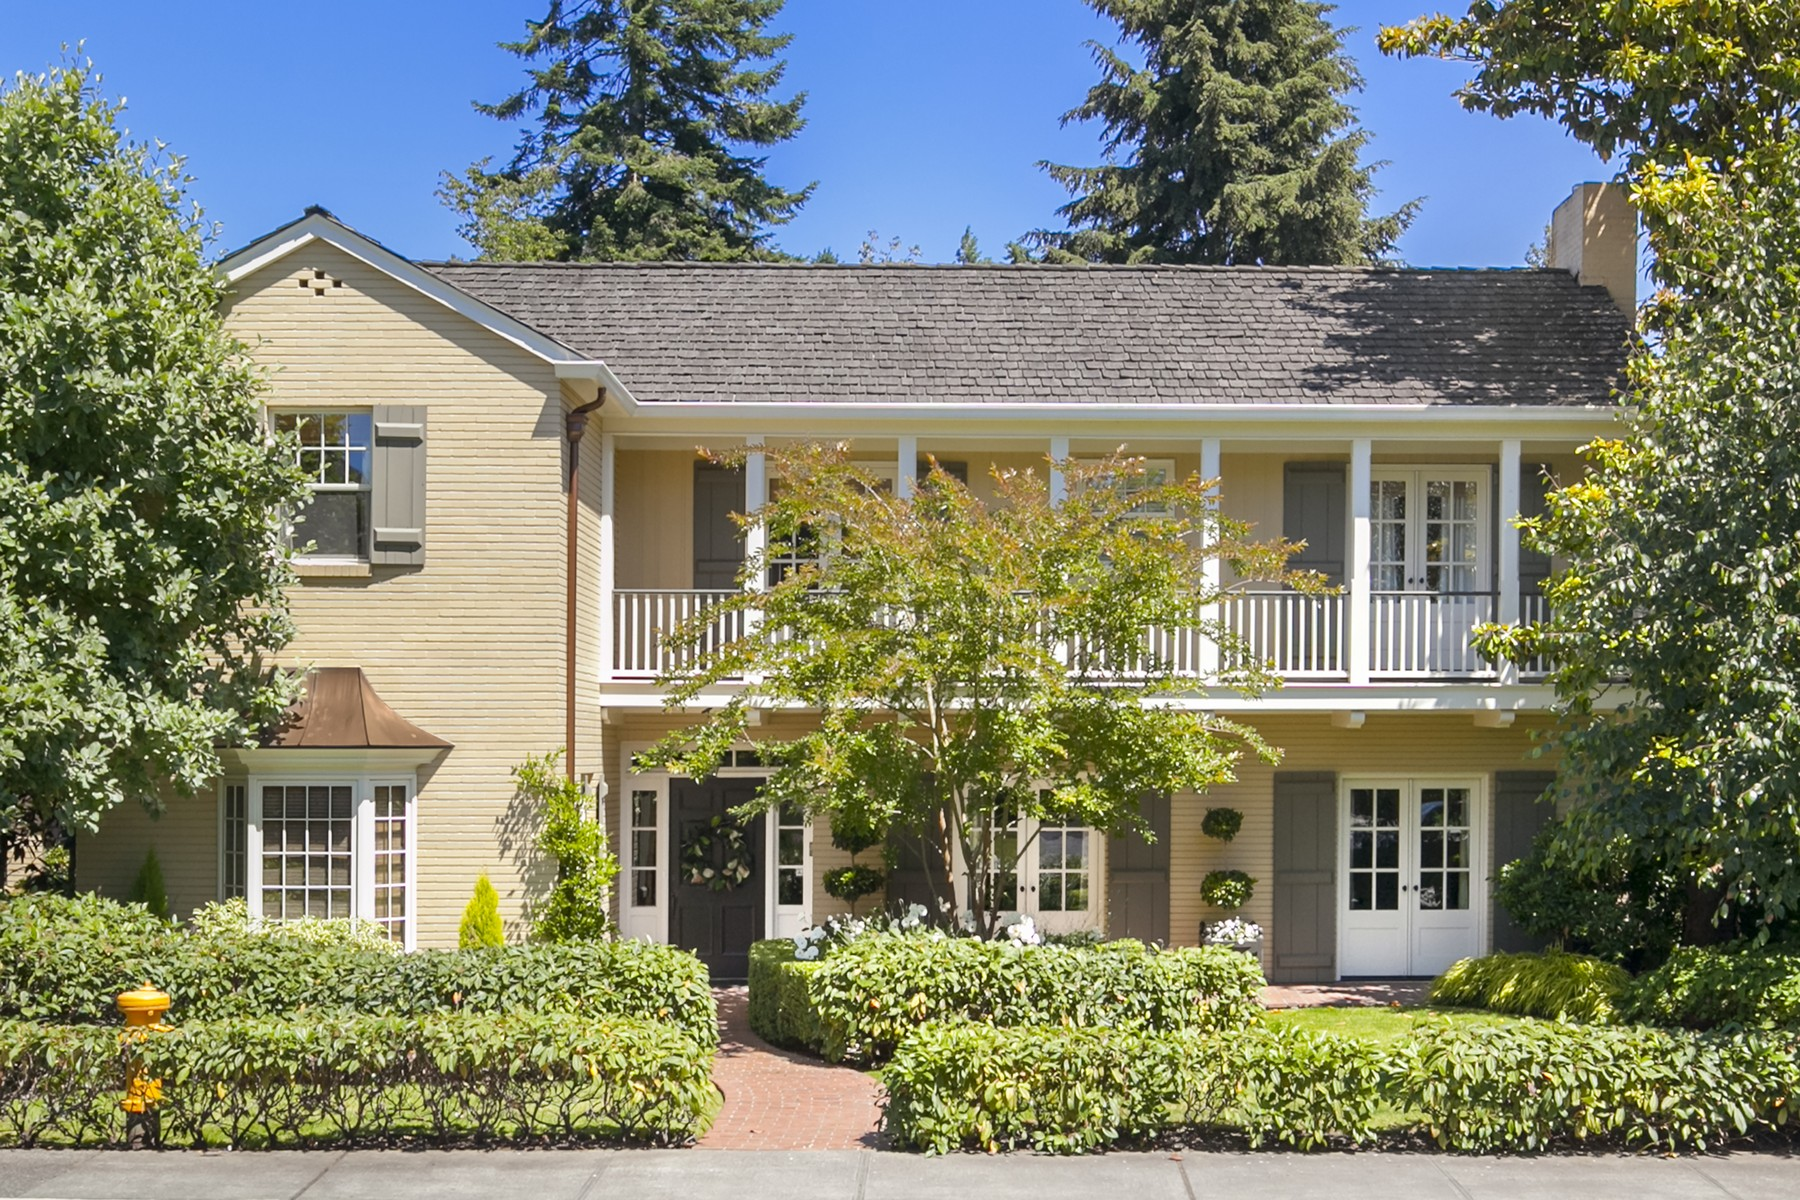 獨棟家庭住宅 為 出售 在 1550 Shenandoah Dr E Seattle, 華盛頓州, 98112 美國